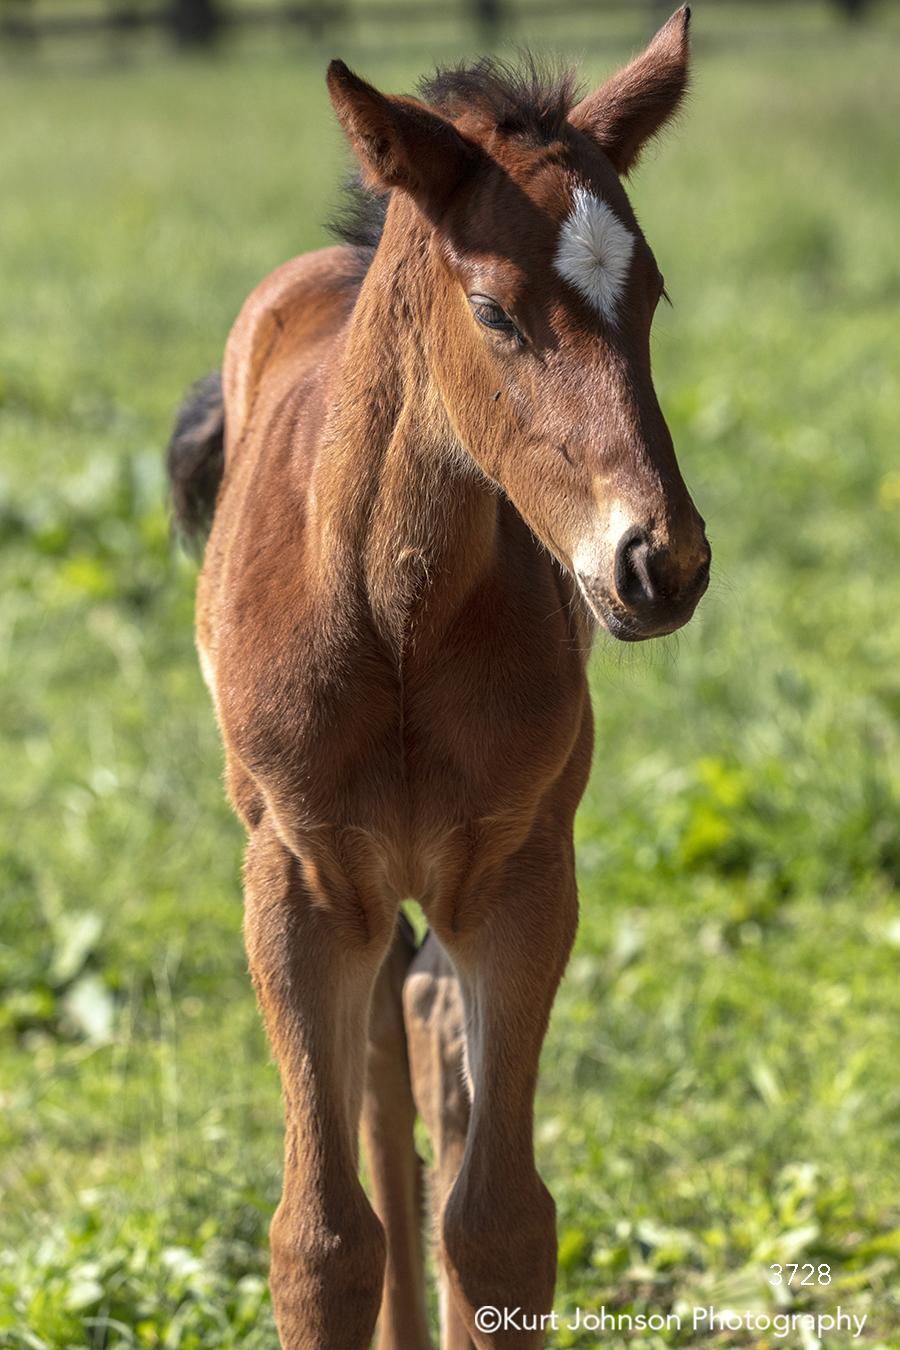 horse pony animal wildlife south southeast kentucky children's art children